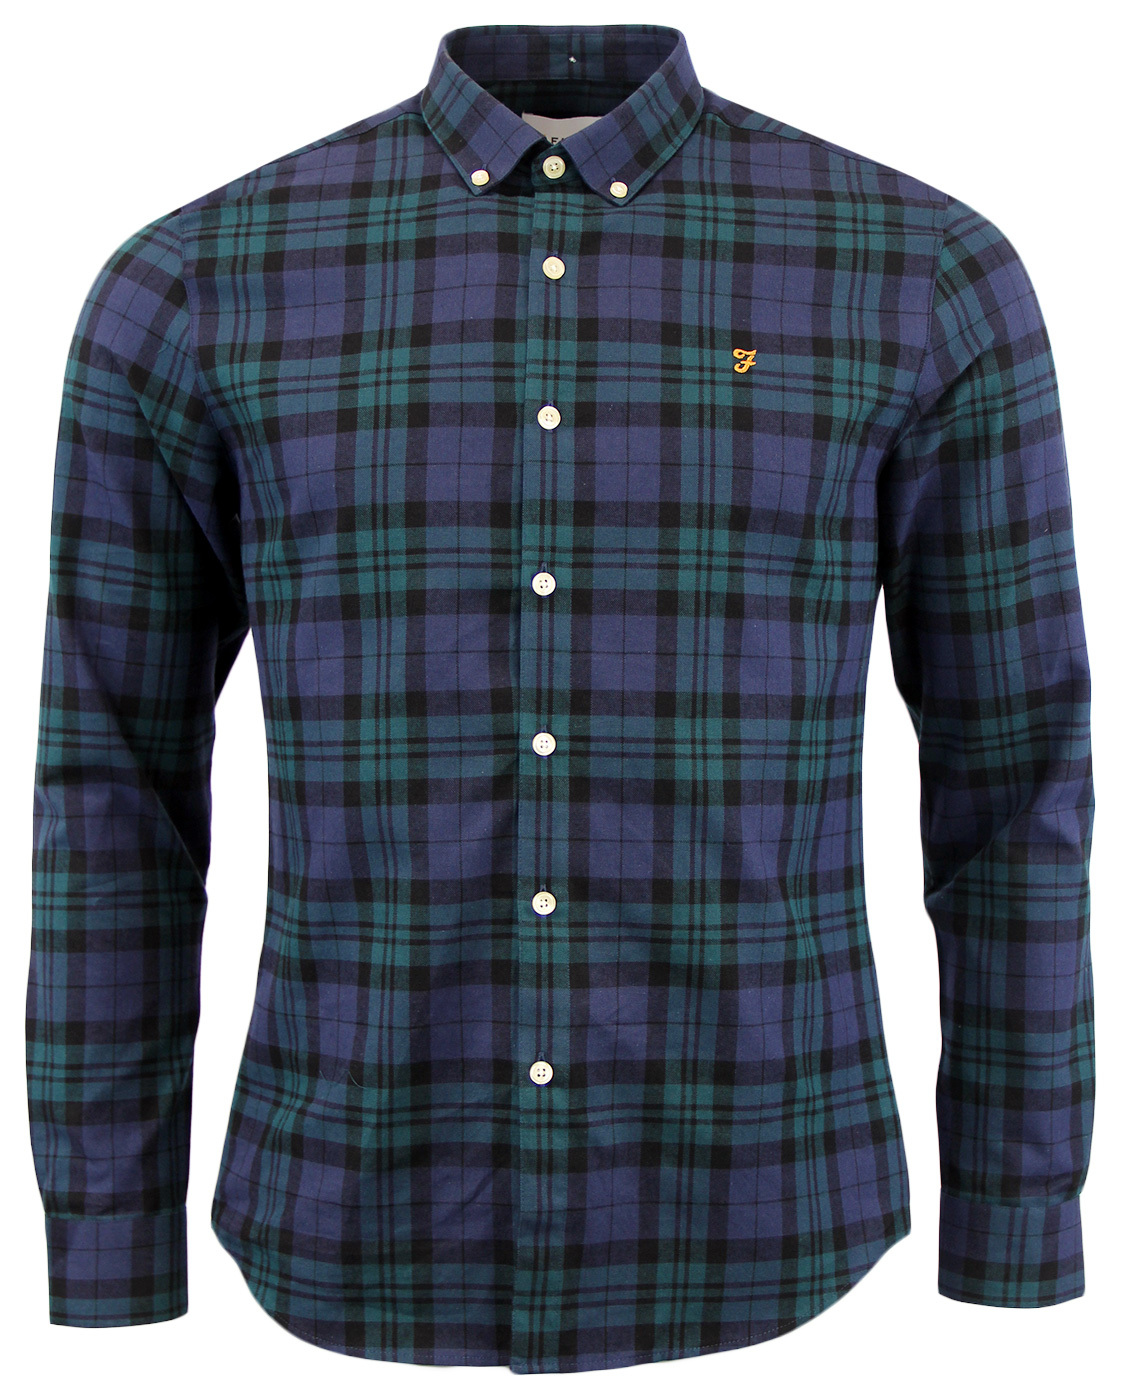 Farah helford retro mod sixties mens tartan shirt in green for Blue and green tartan shirt